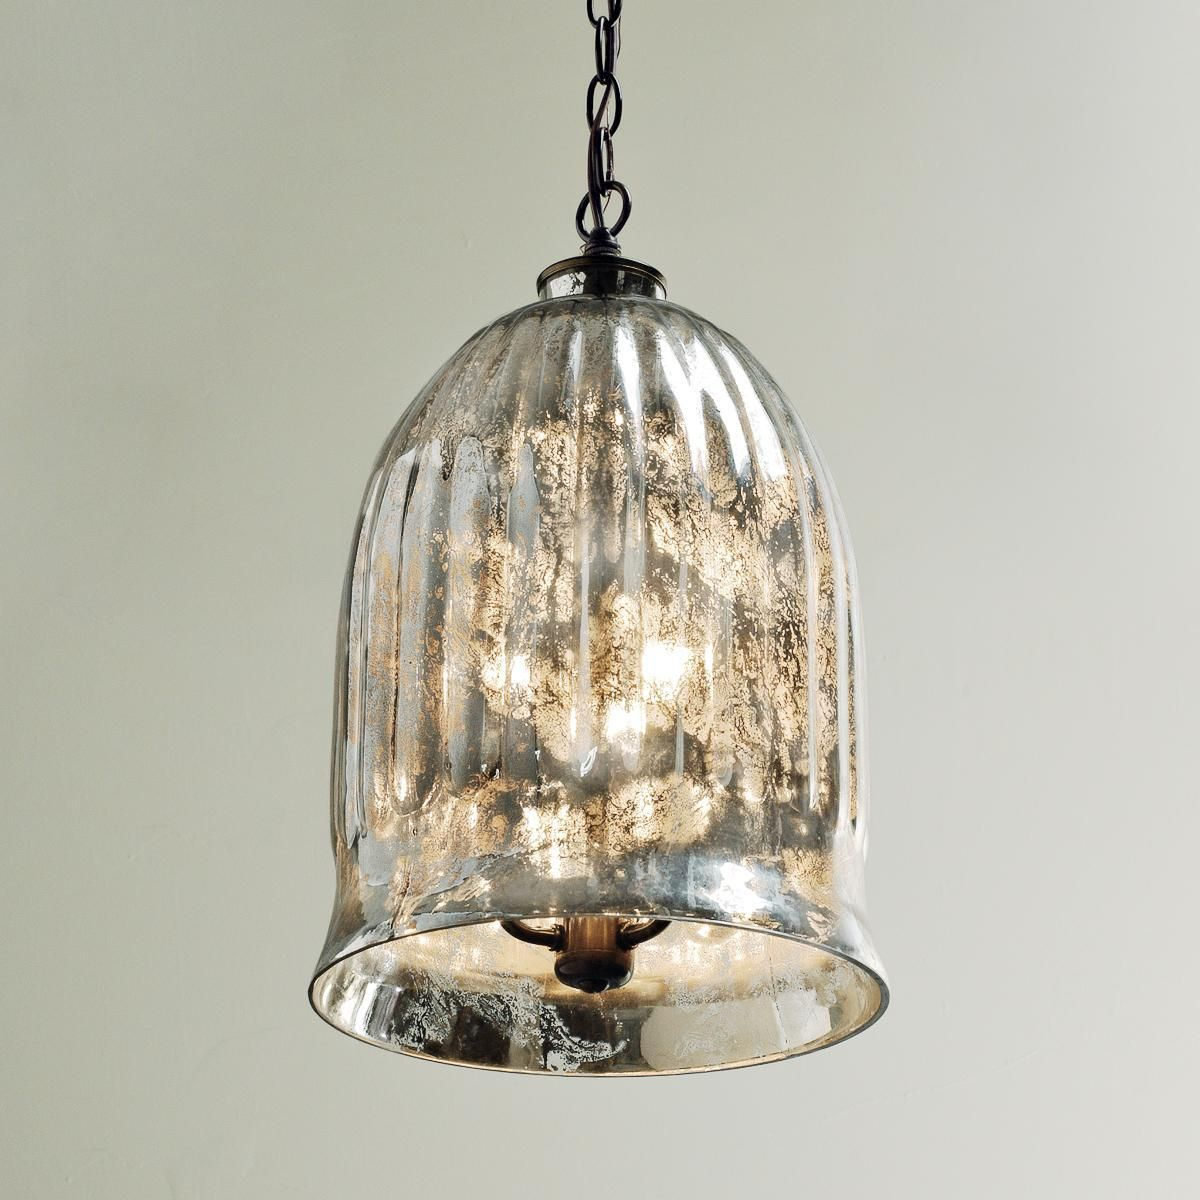 antique mirror bell pendant lantern glass bell jar bell jars antique mirror bell pendant lantern